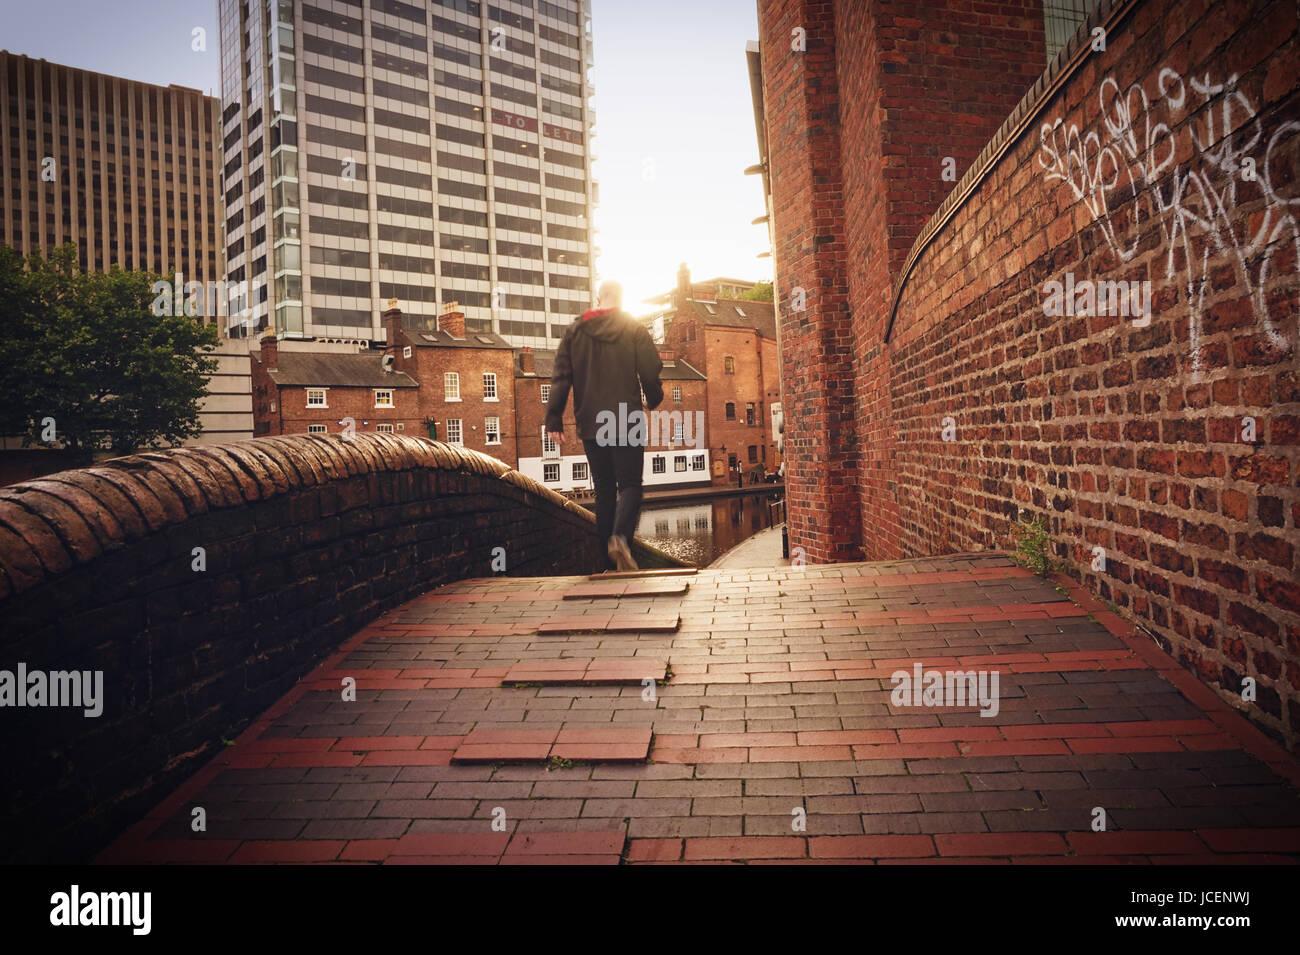 Birmingham Canals. UK - Stock Image